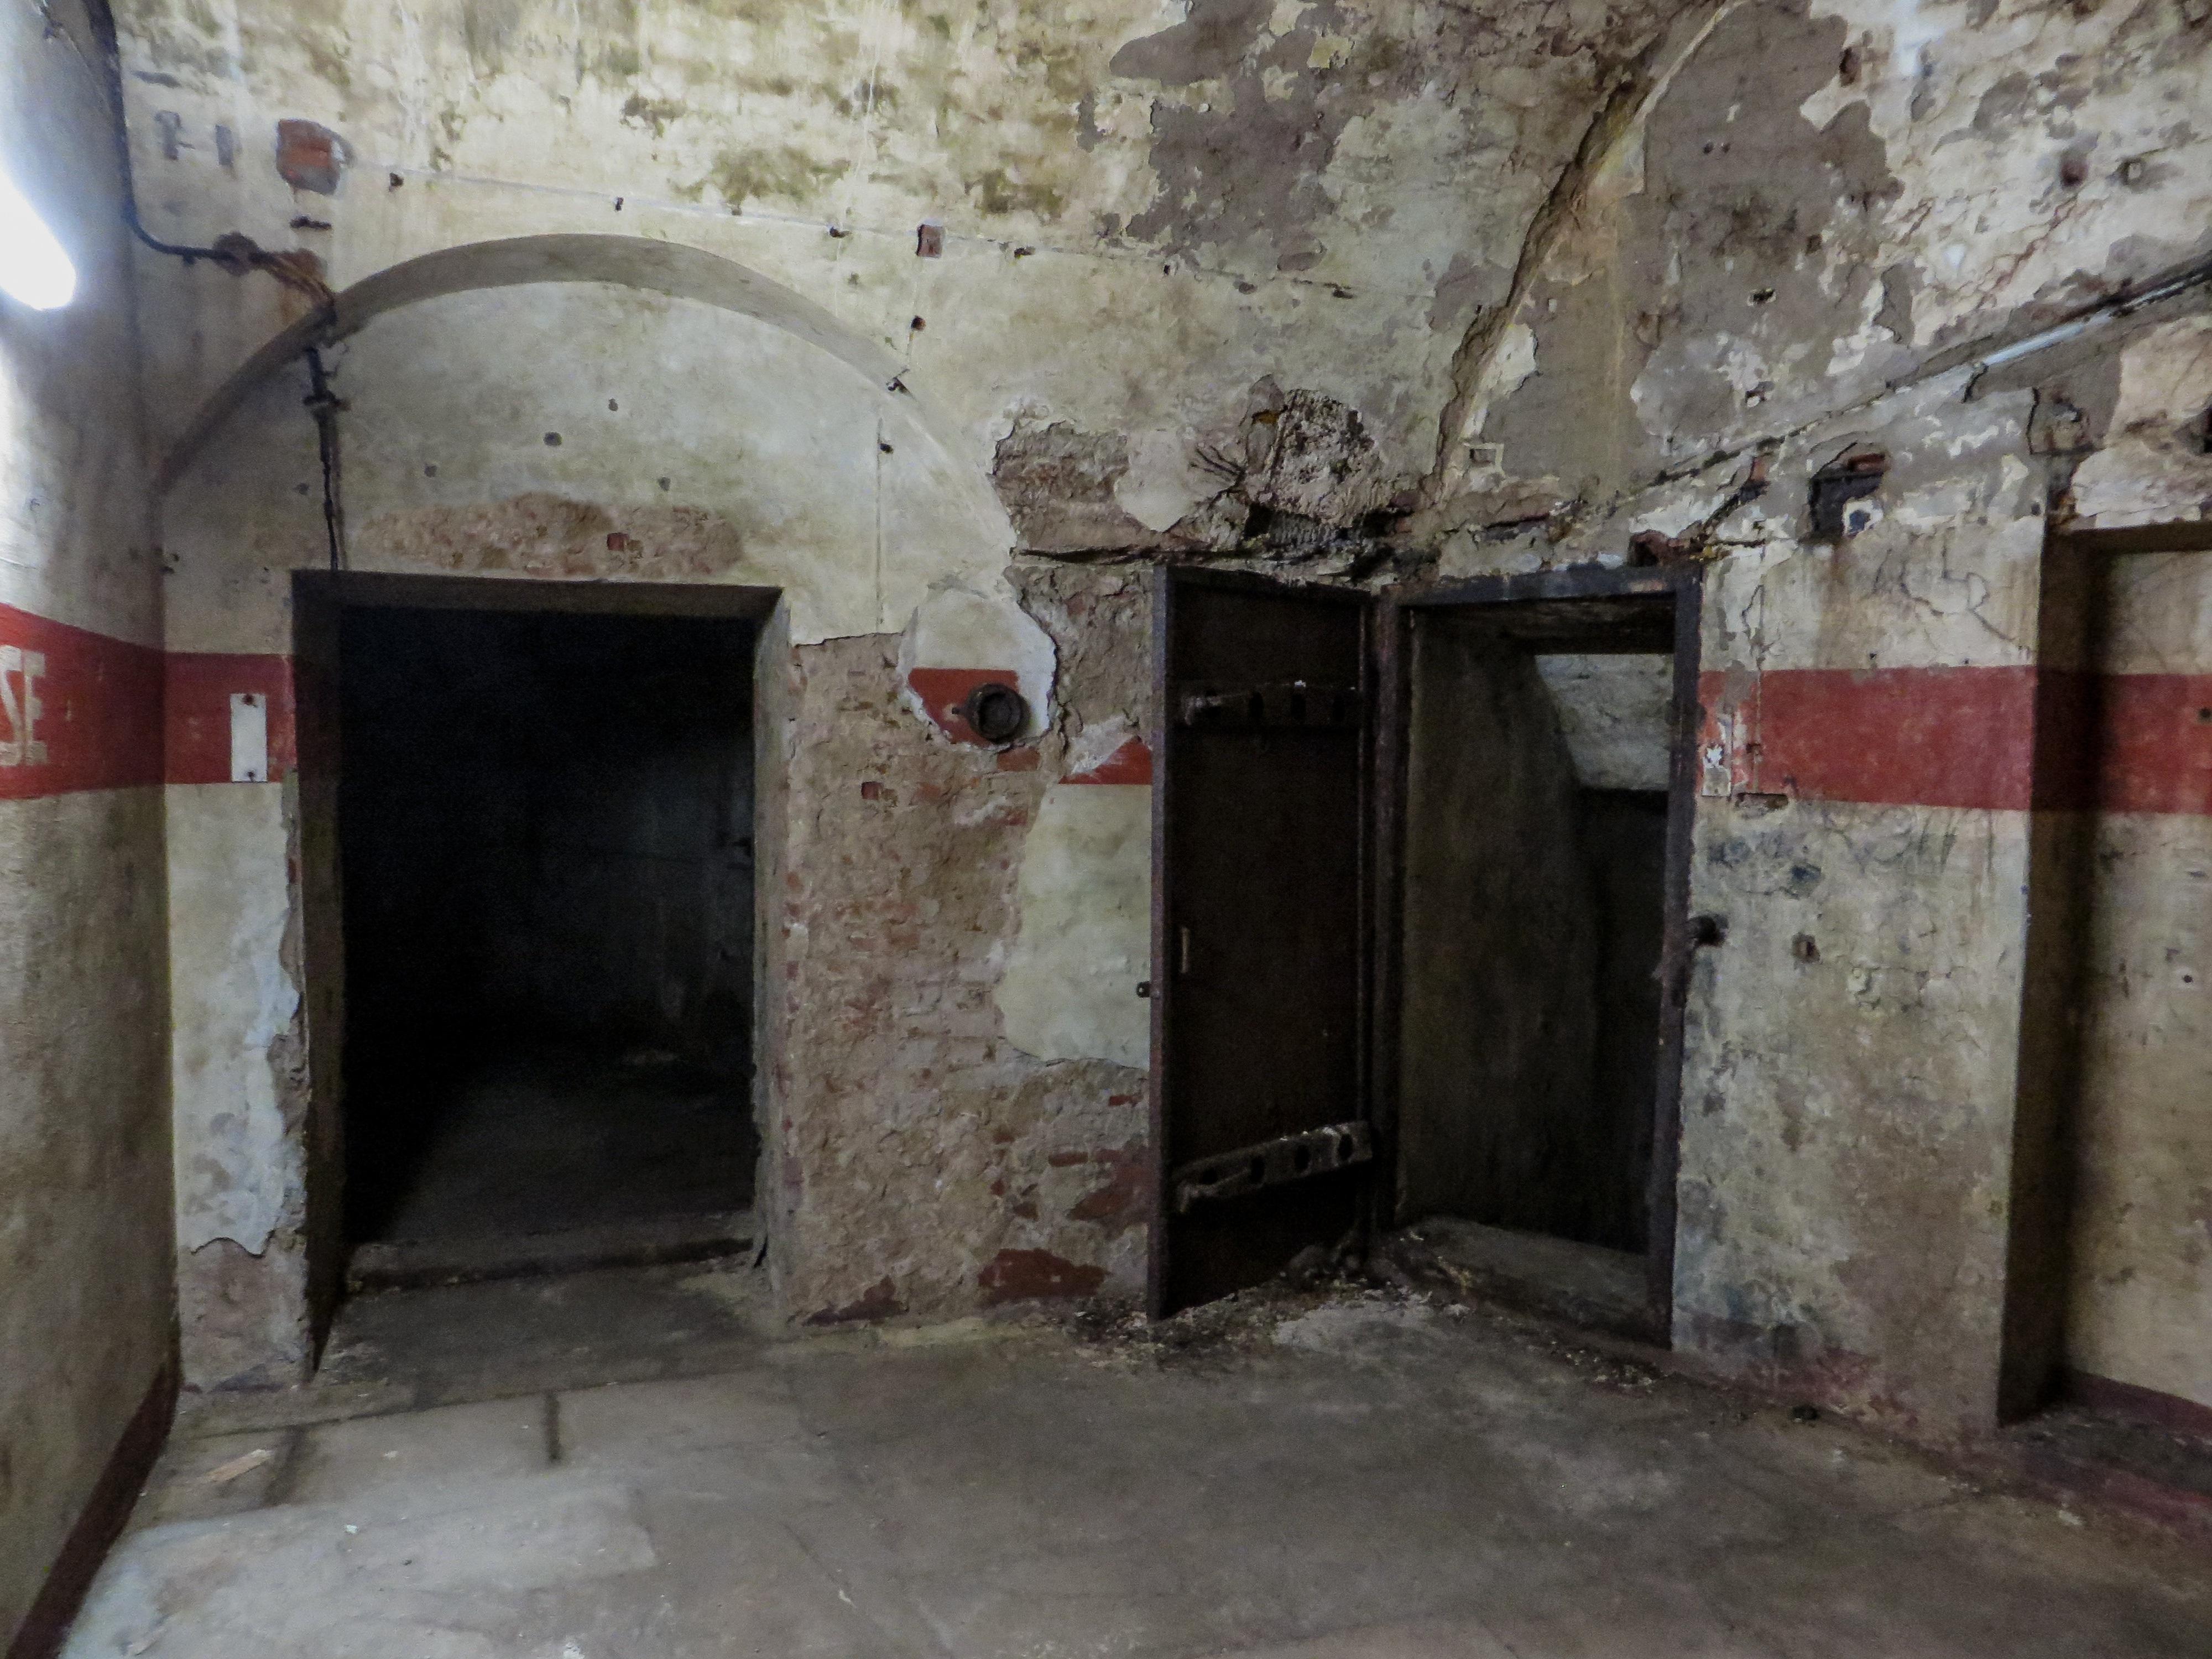 Free photos: Bunker - 29 images, Bunker photos, Bunker